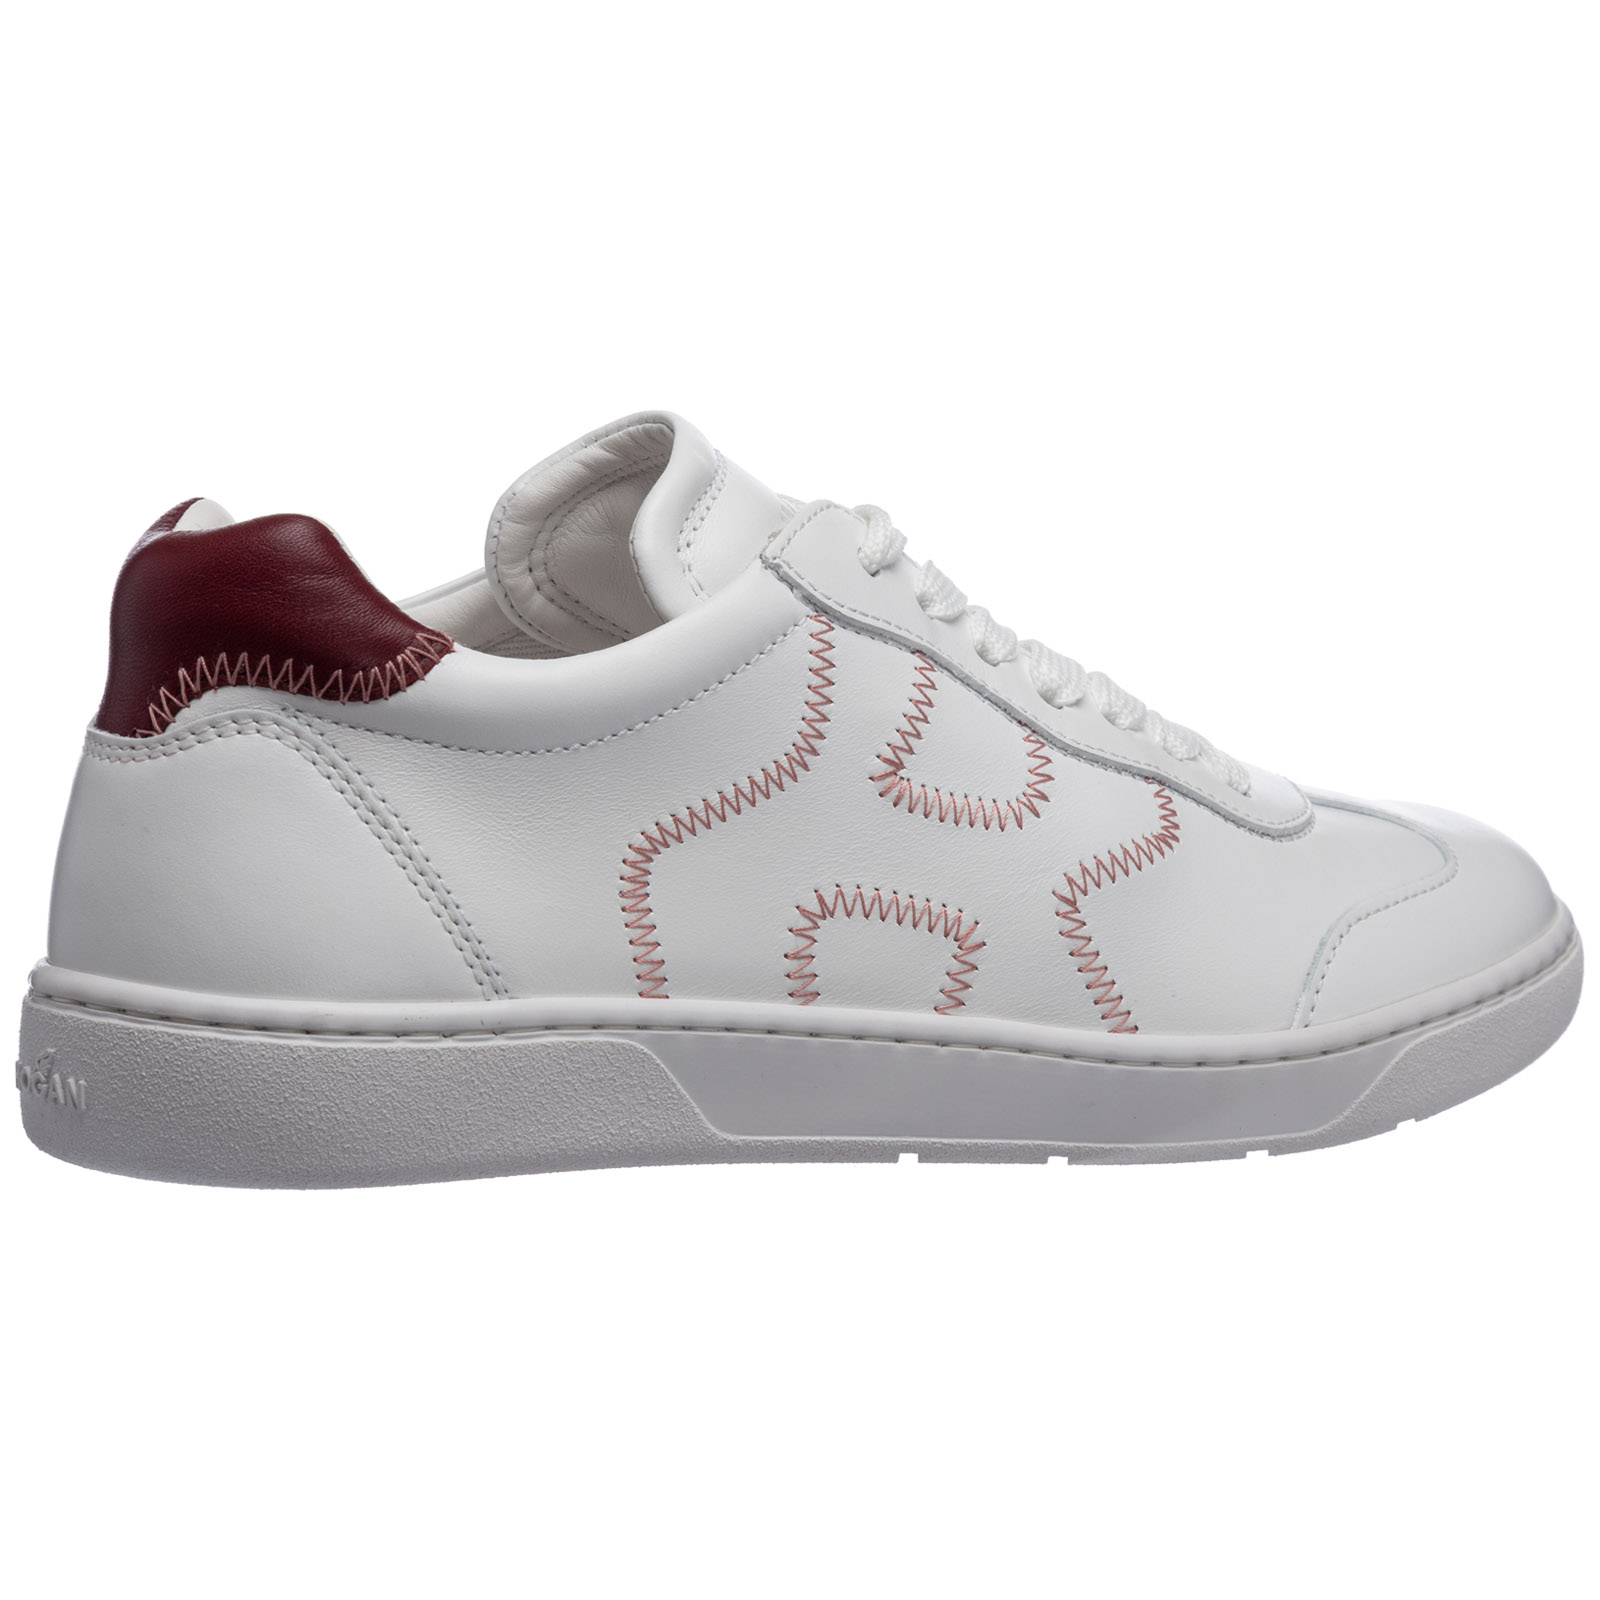 Scarpe sneakers donna in pelle h327